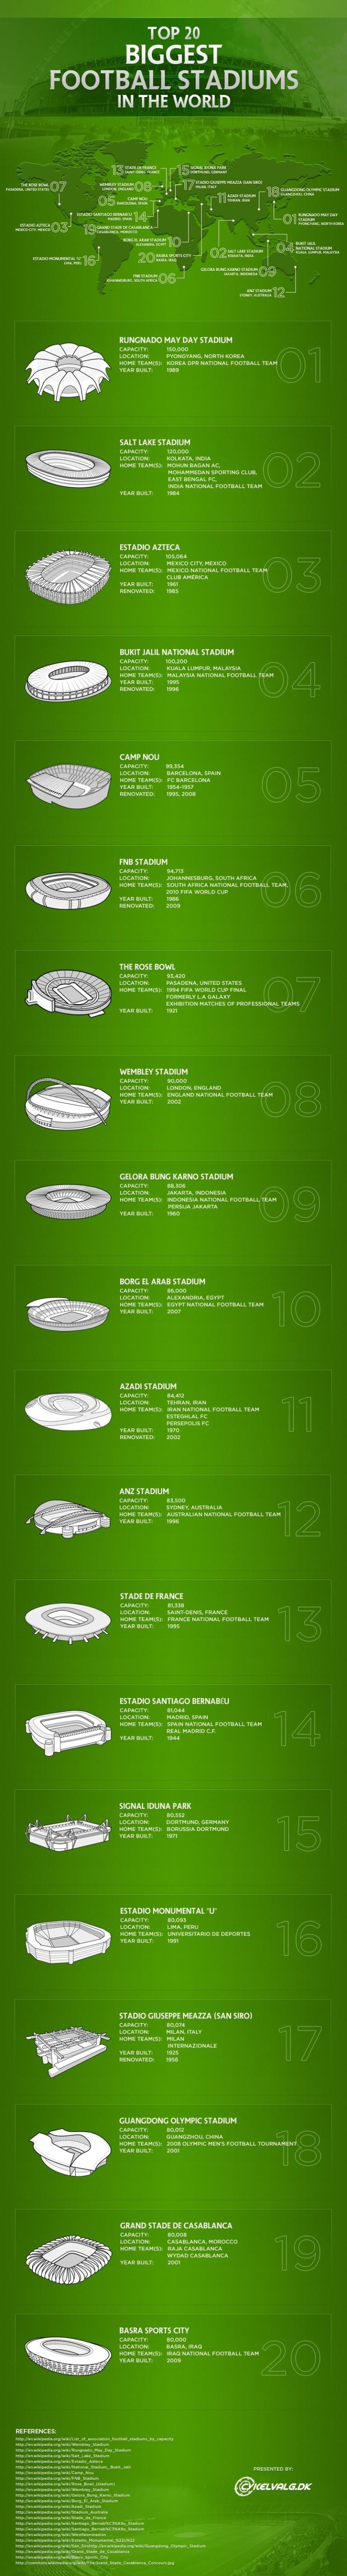 Top 20 Football Statiums